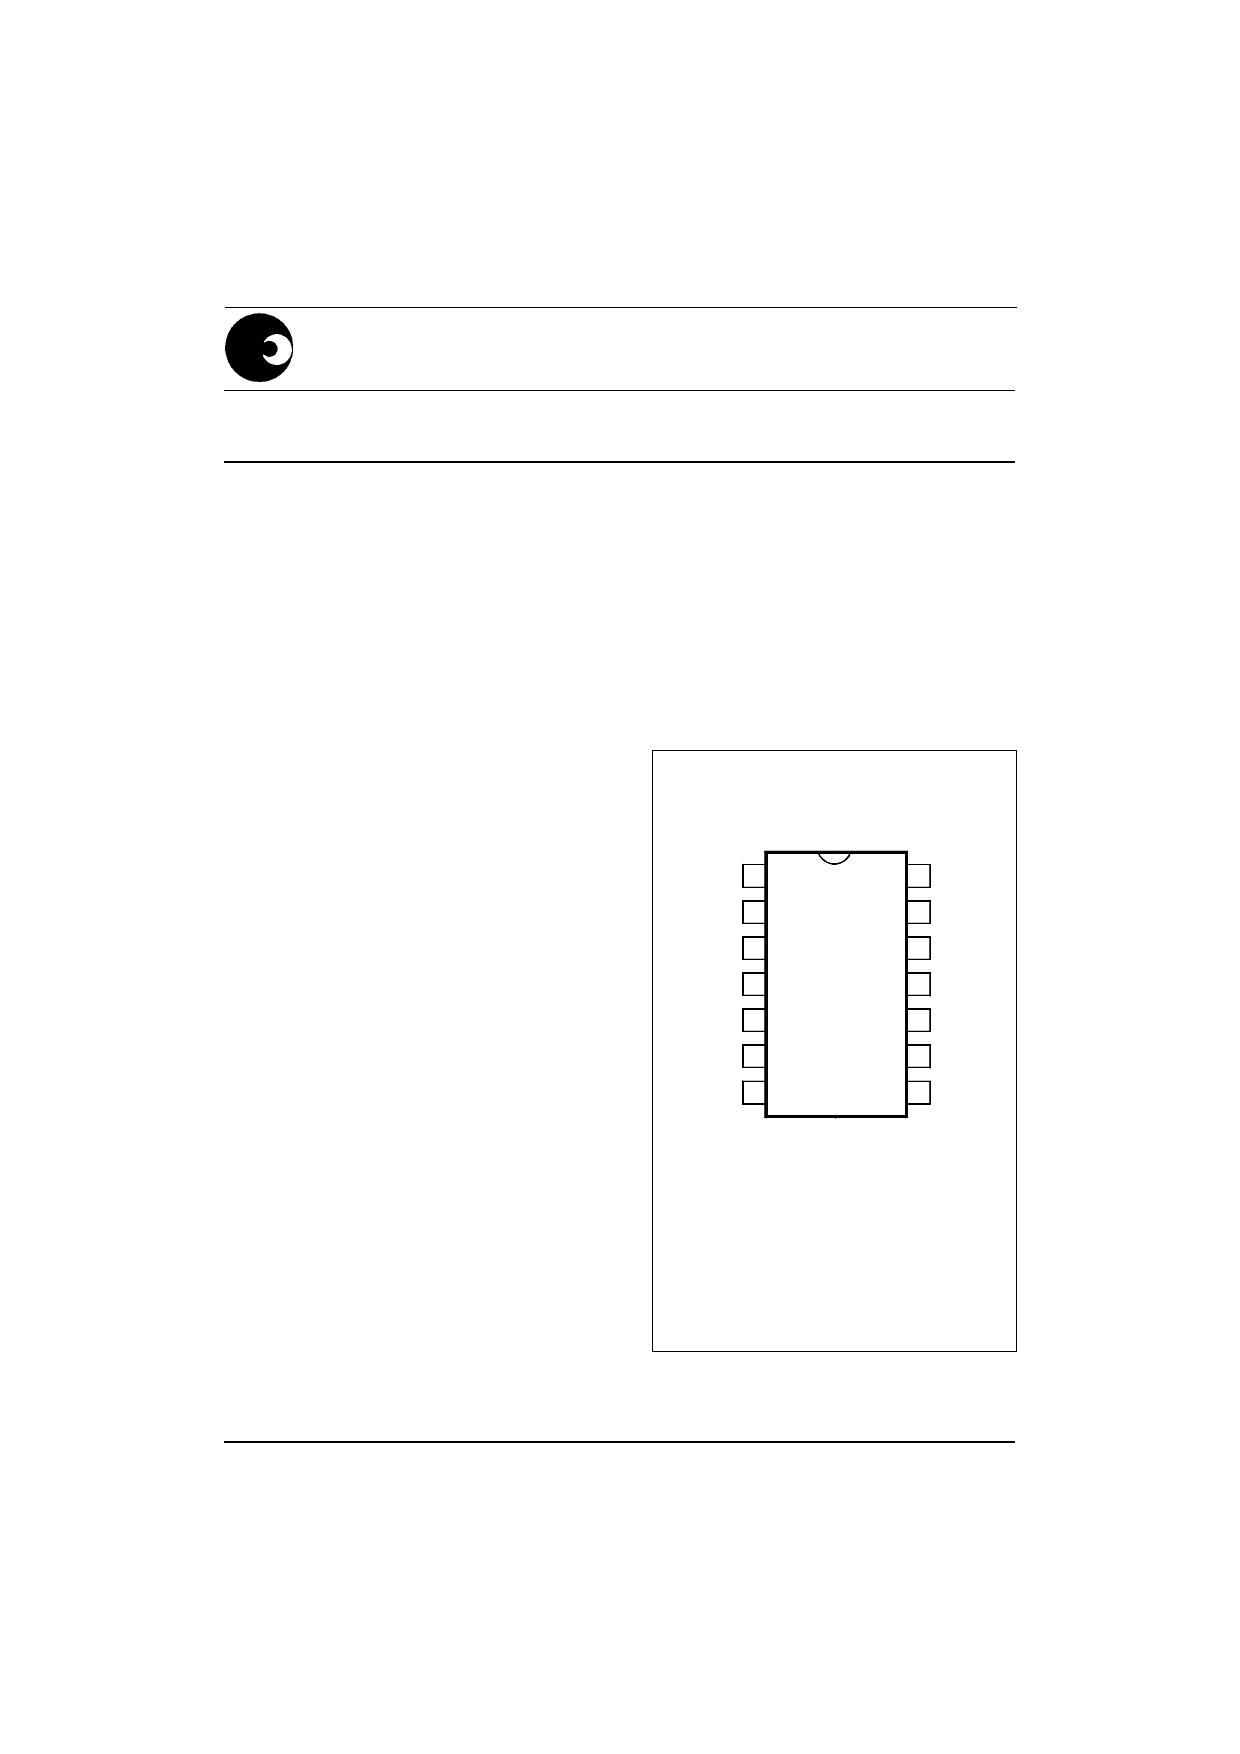 SA9602HSA datasheet